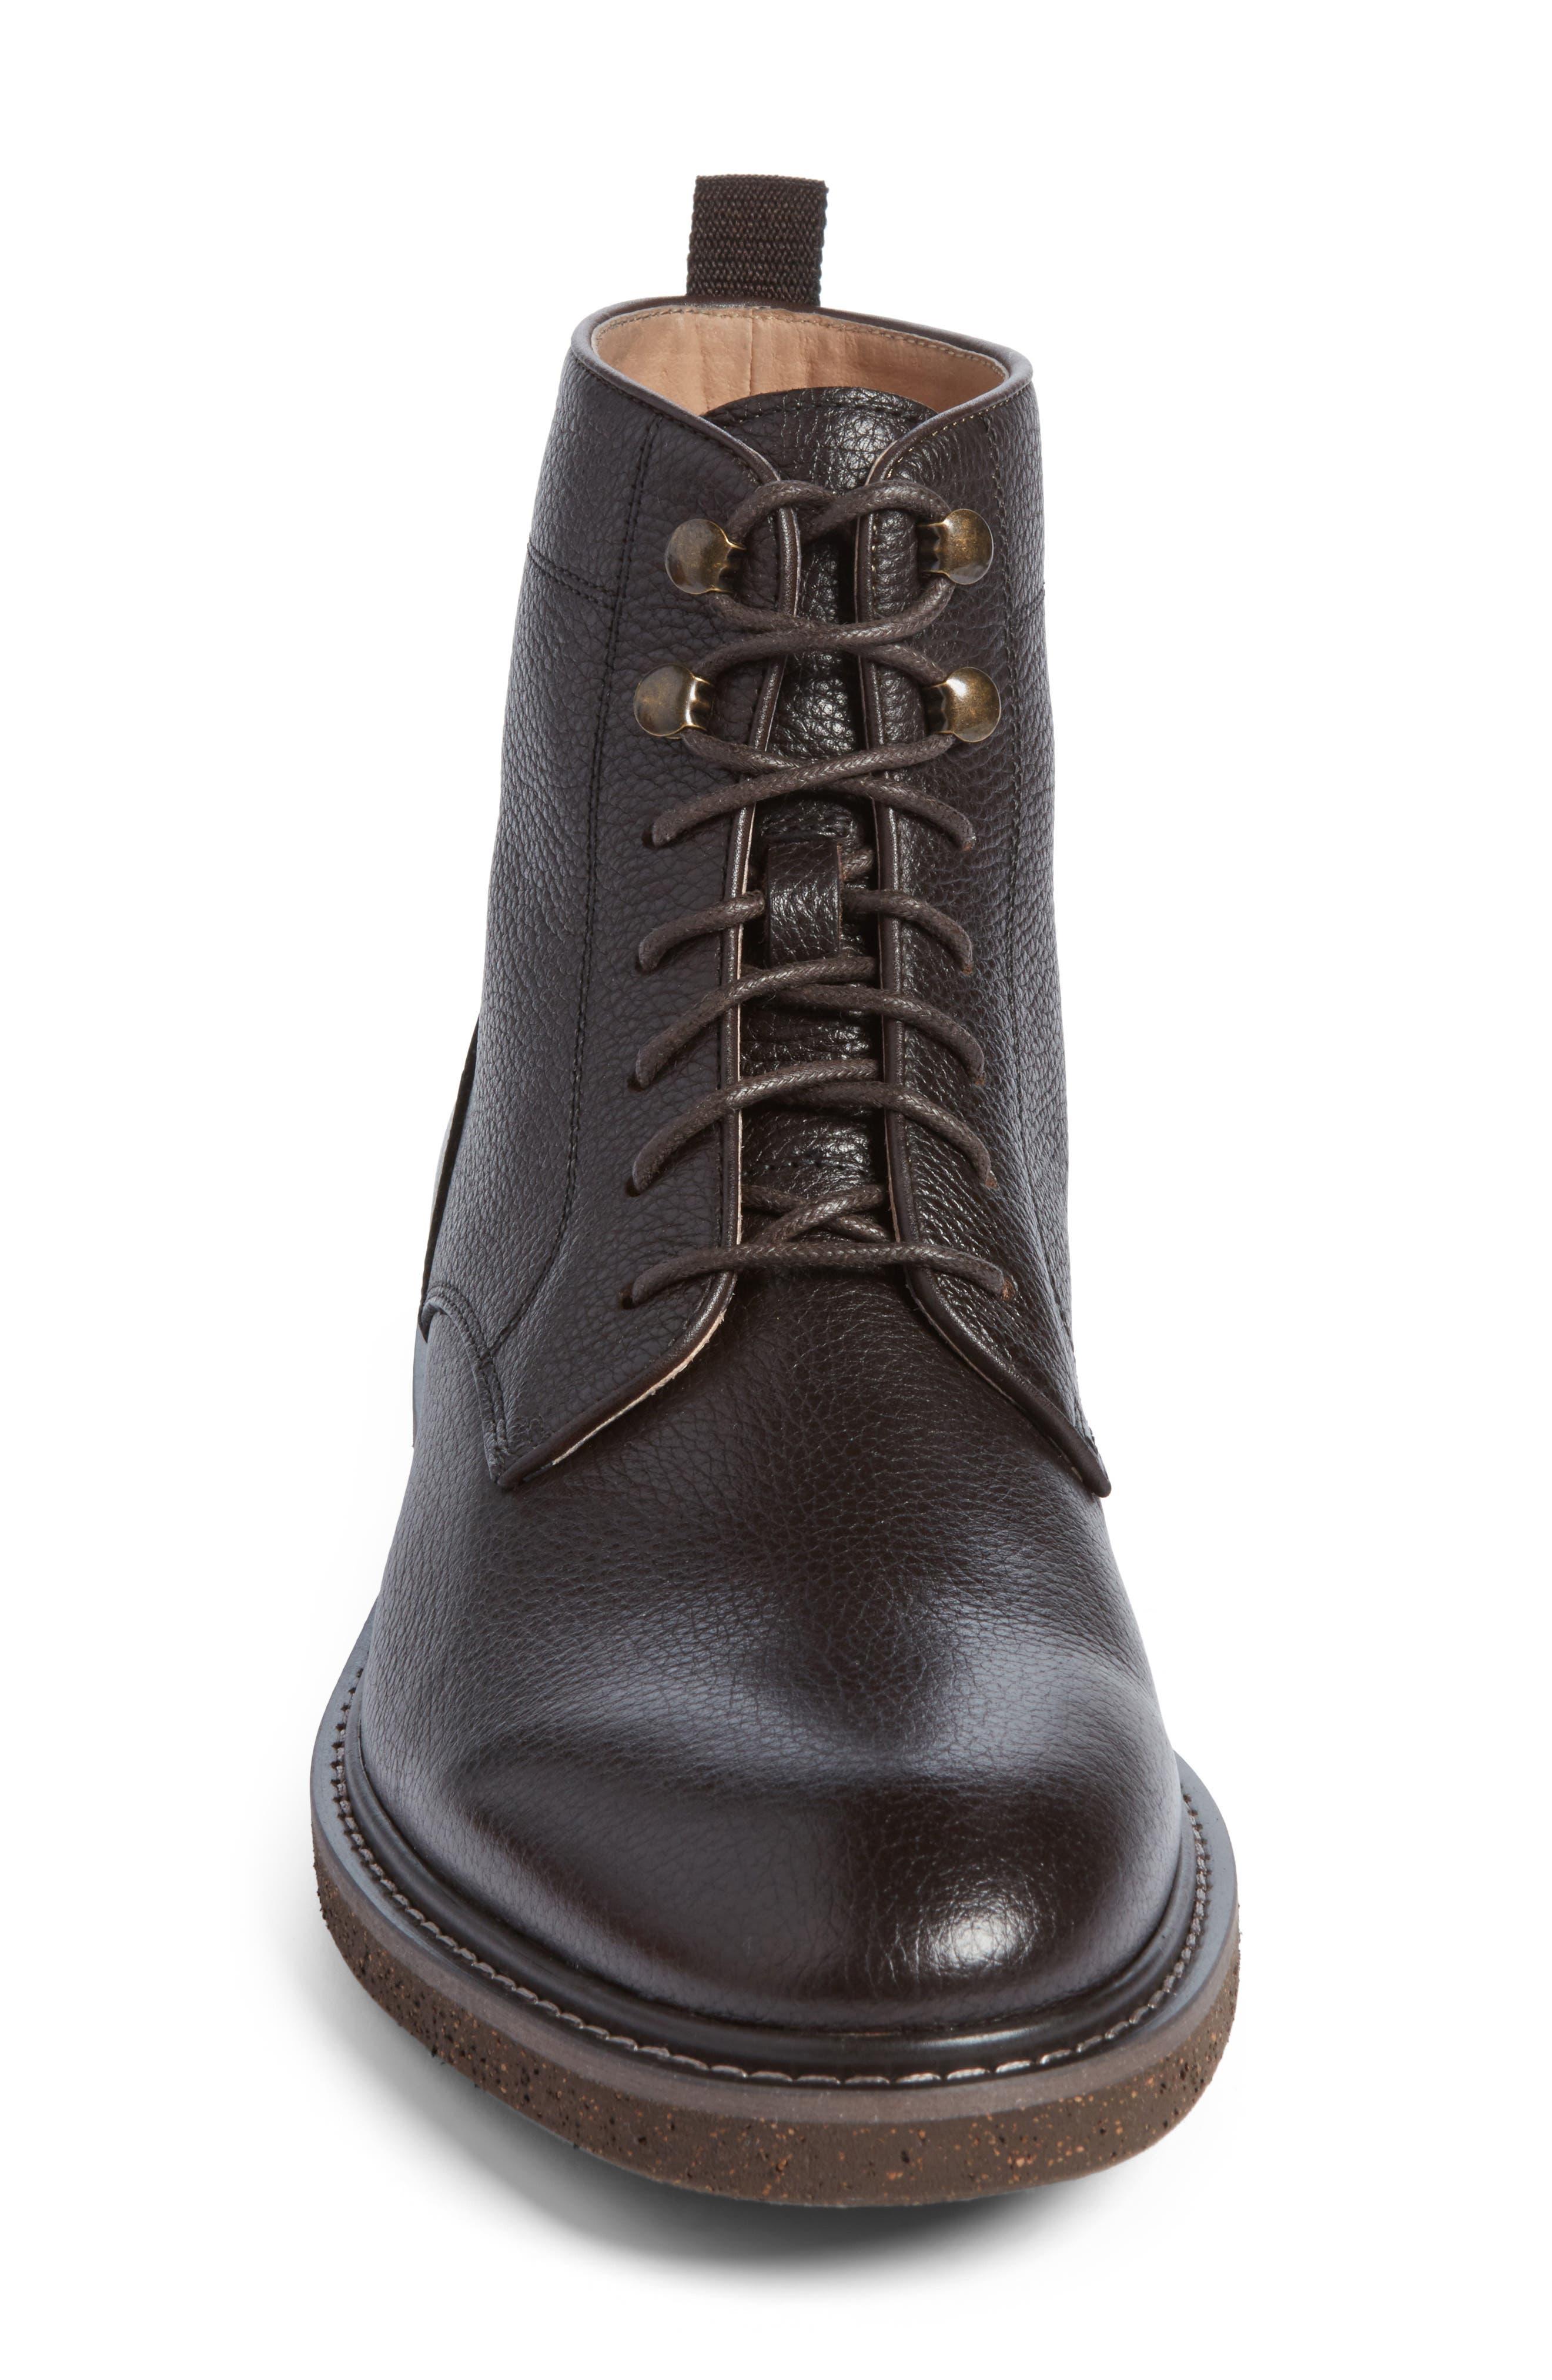 Trenton Plain Toe Boot,                             Alternate thumbnail 6, color,                             Chocolate Leather